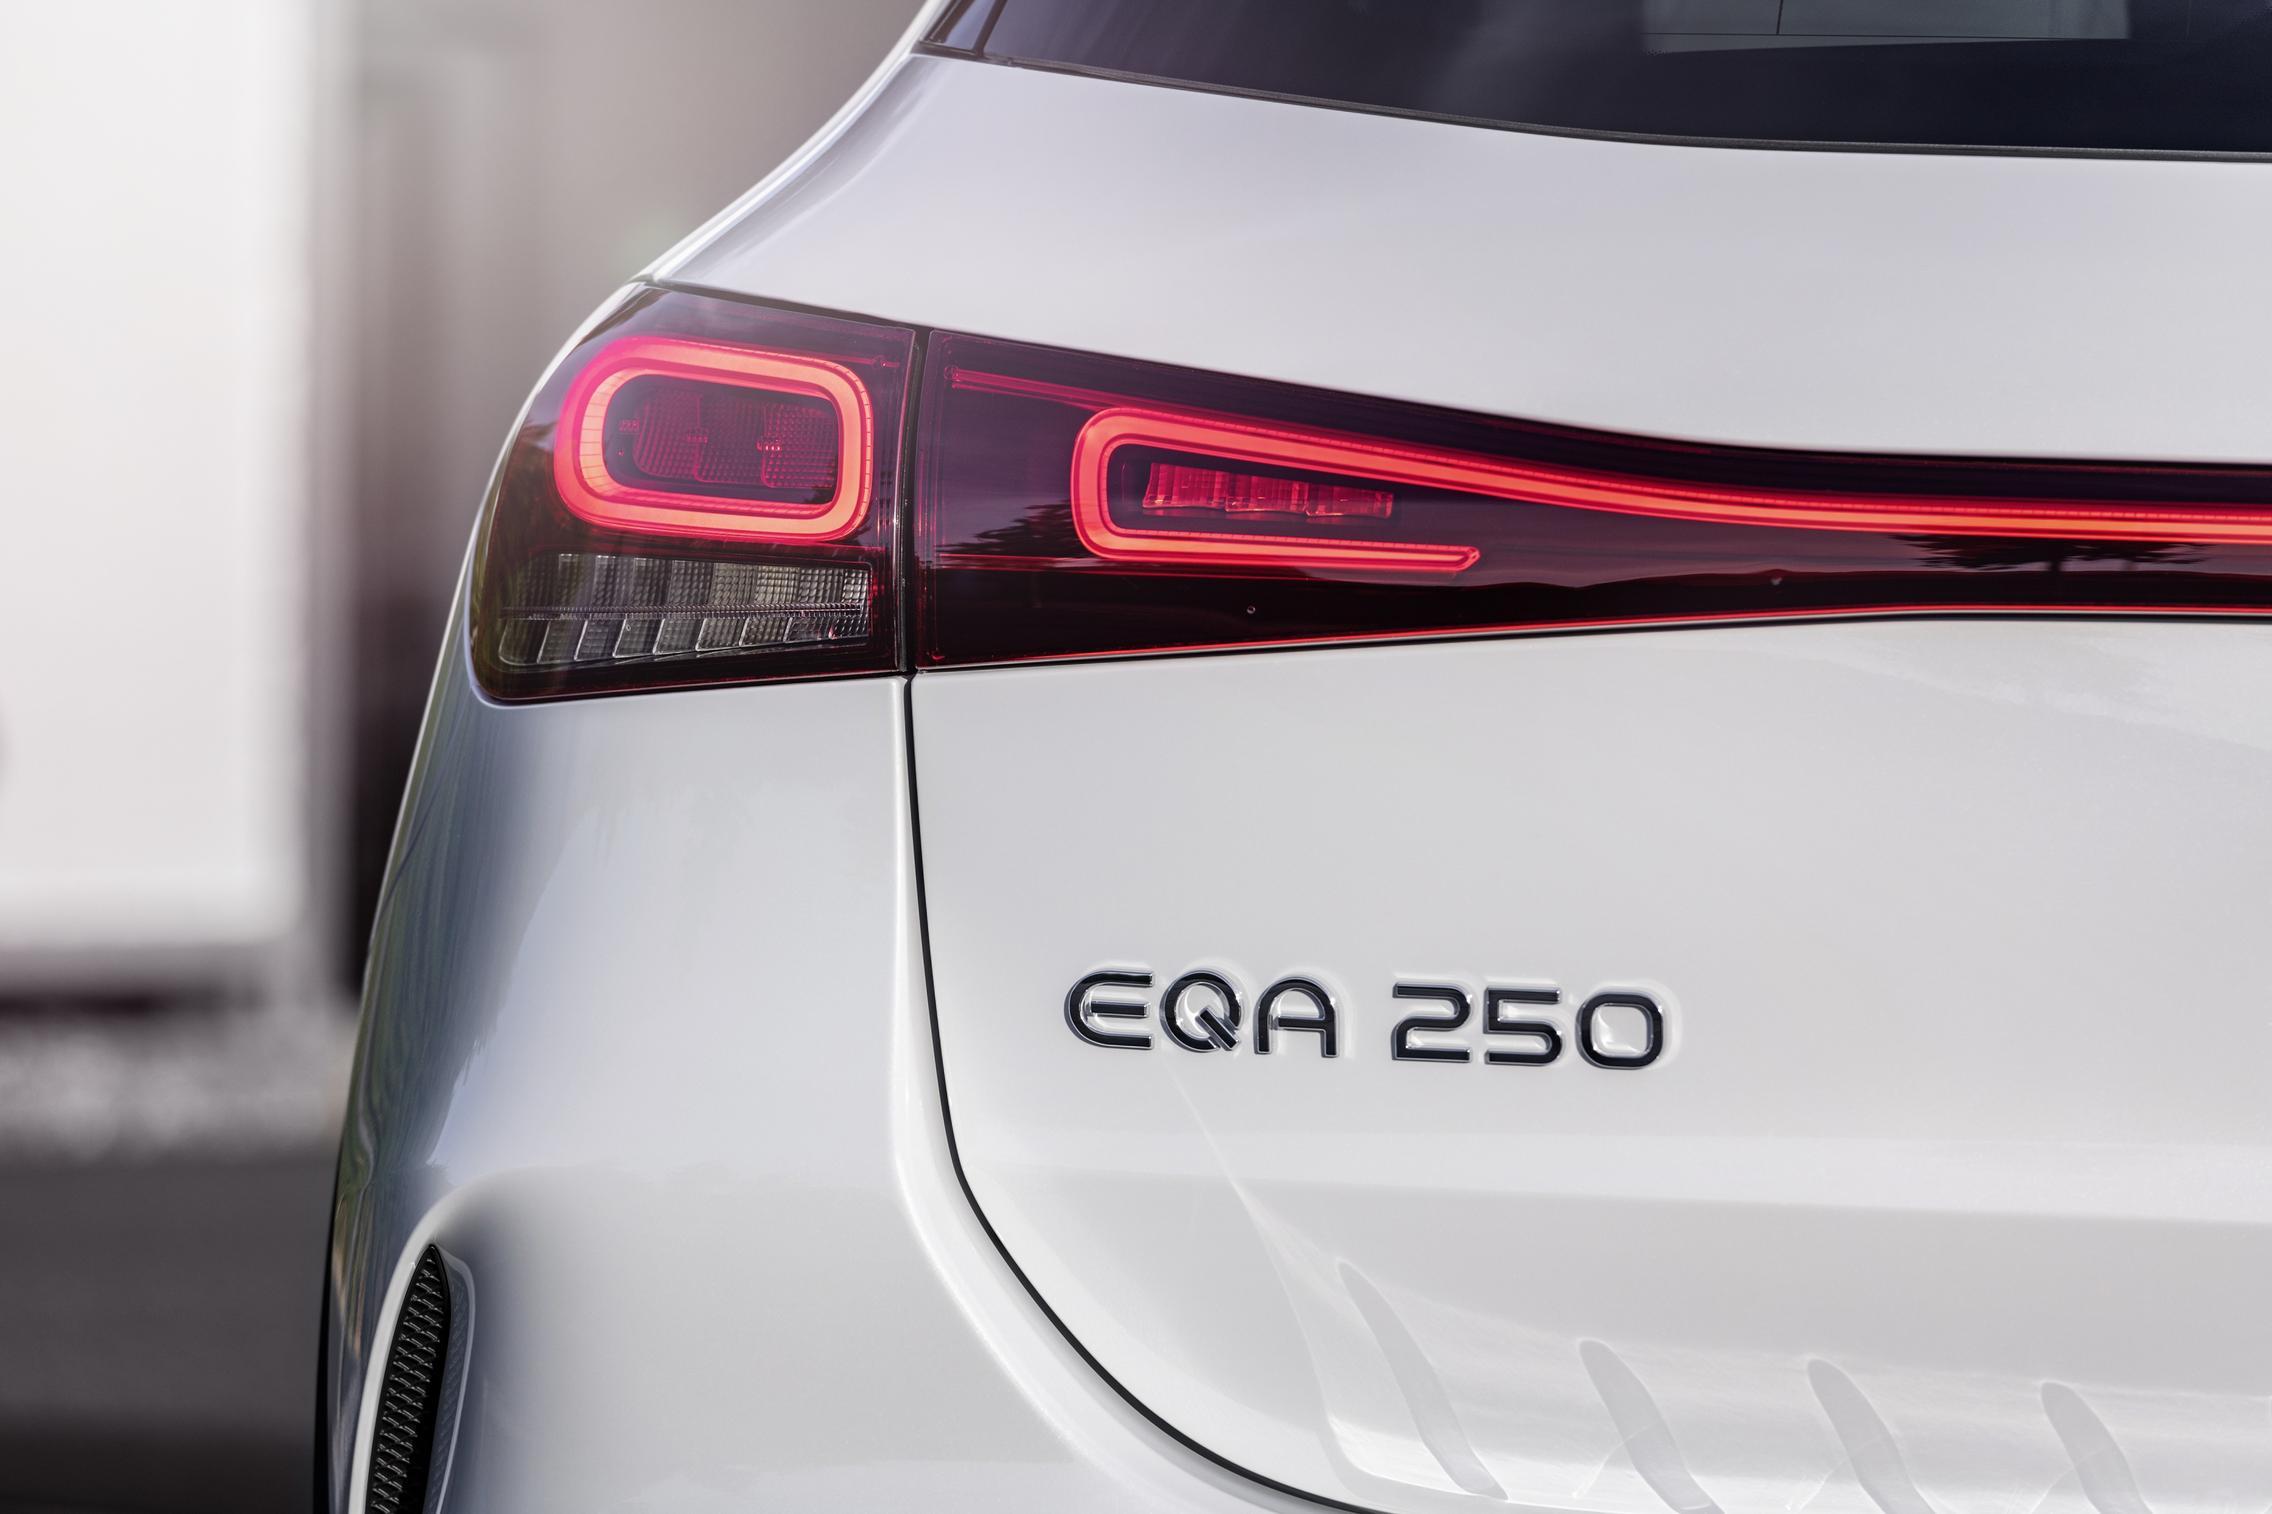 EQA 250